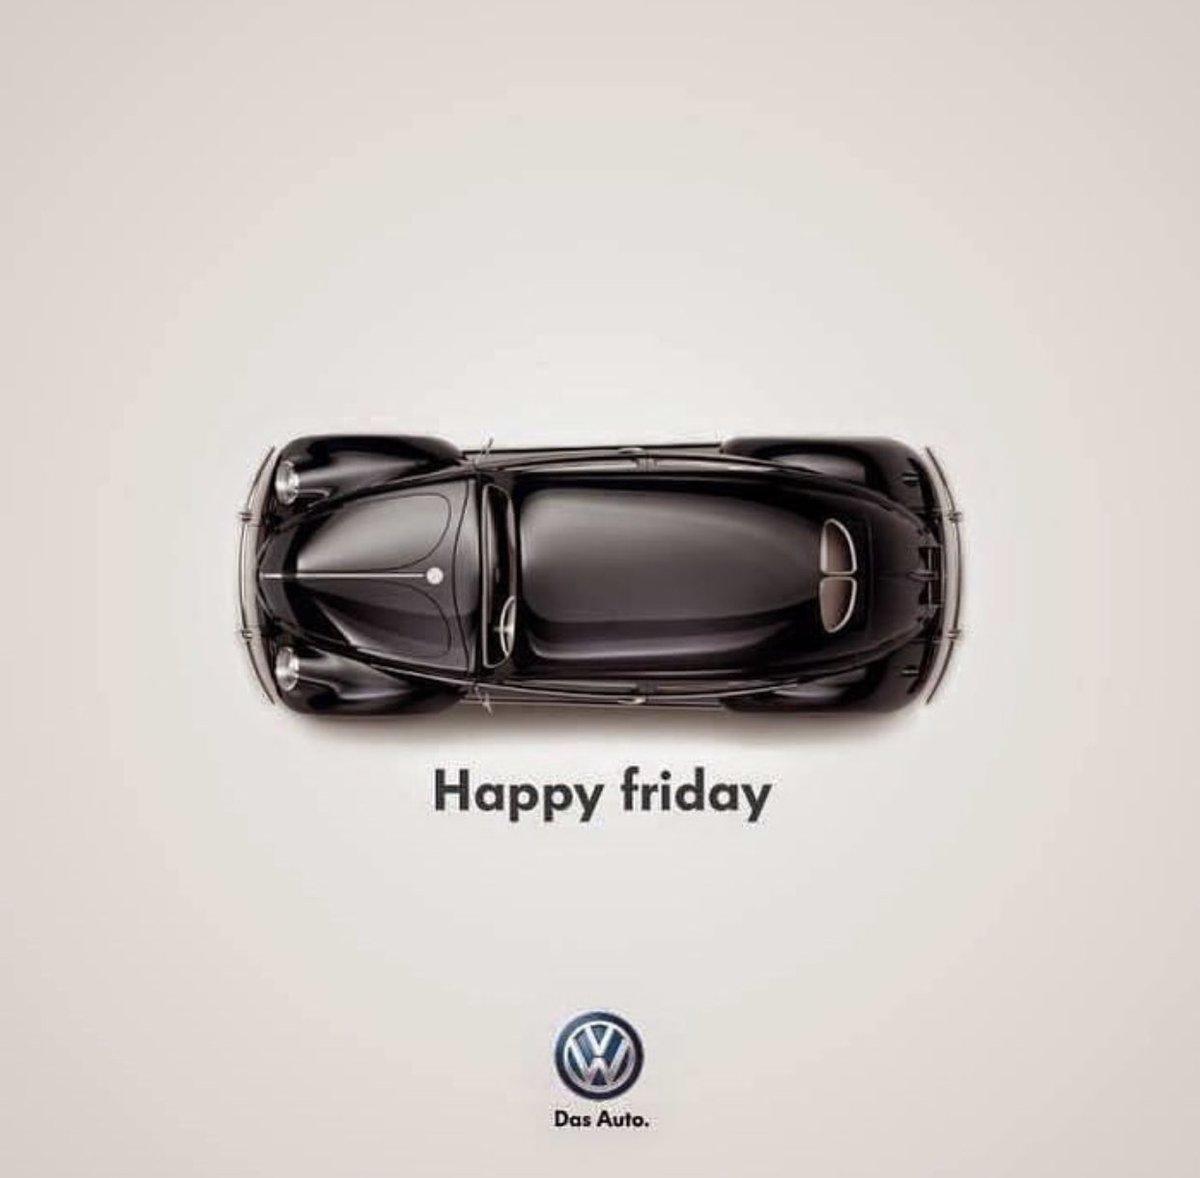 it's the #weekend #HappyFriday #VW #volkswagen #aircooled #watercooled https://t.co/Dg69NmcFME